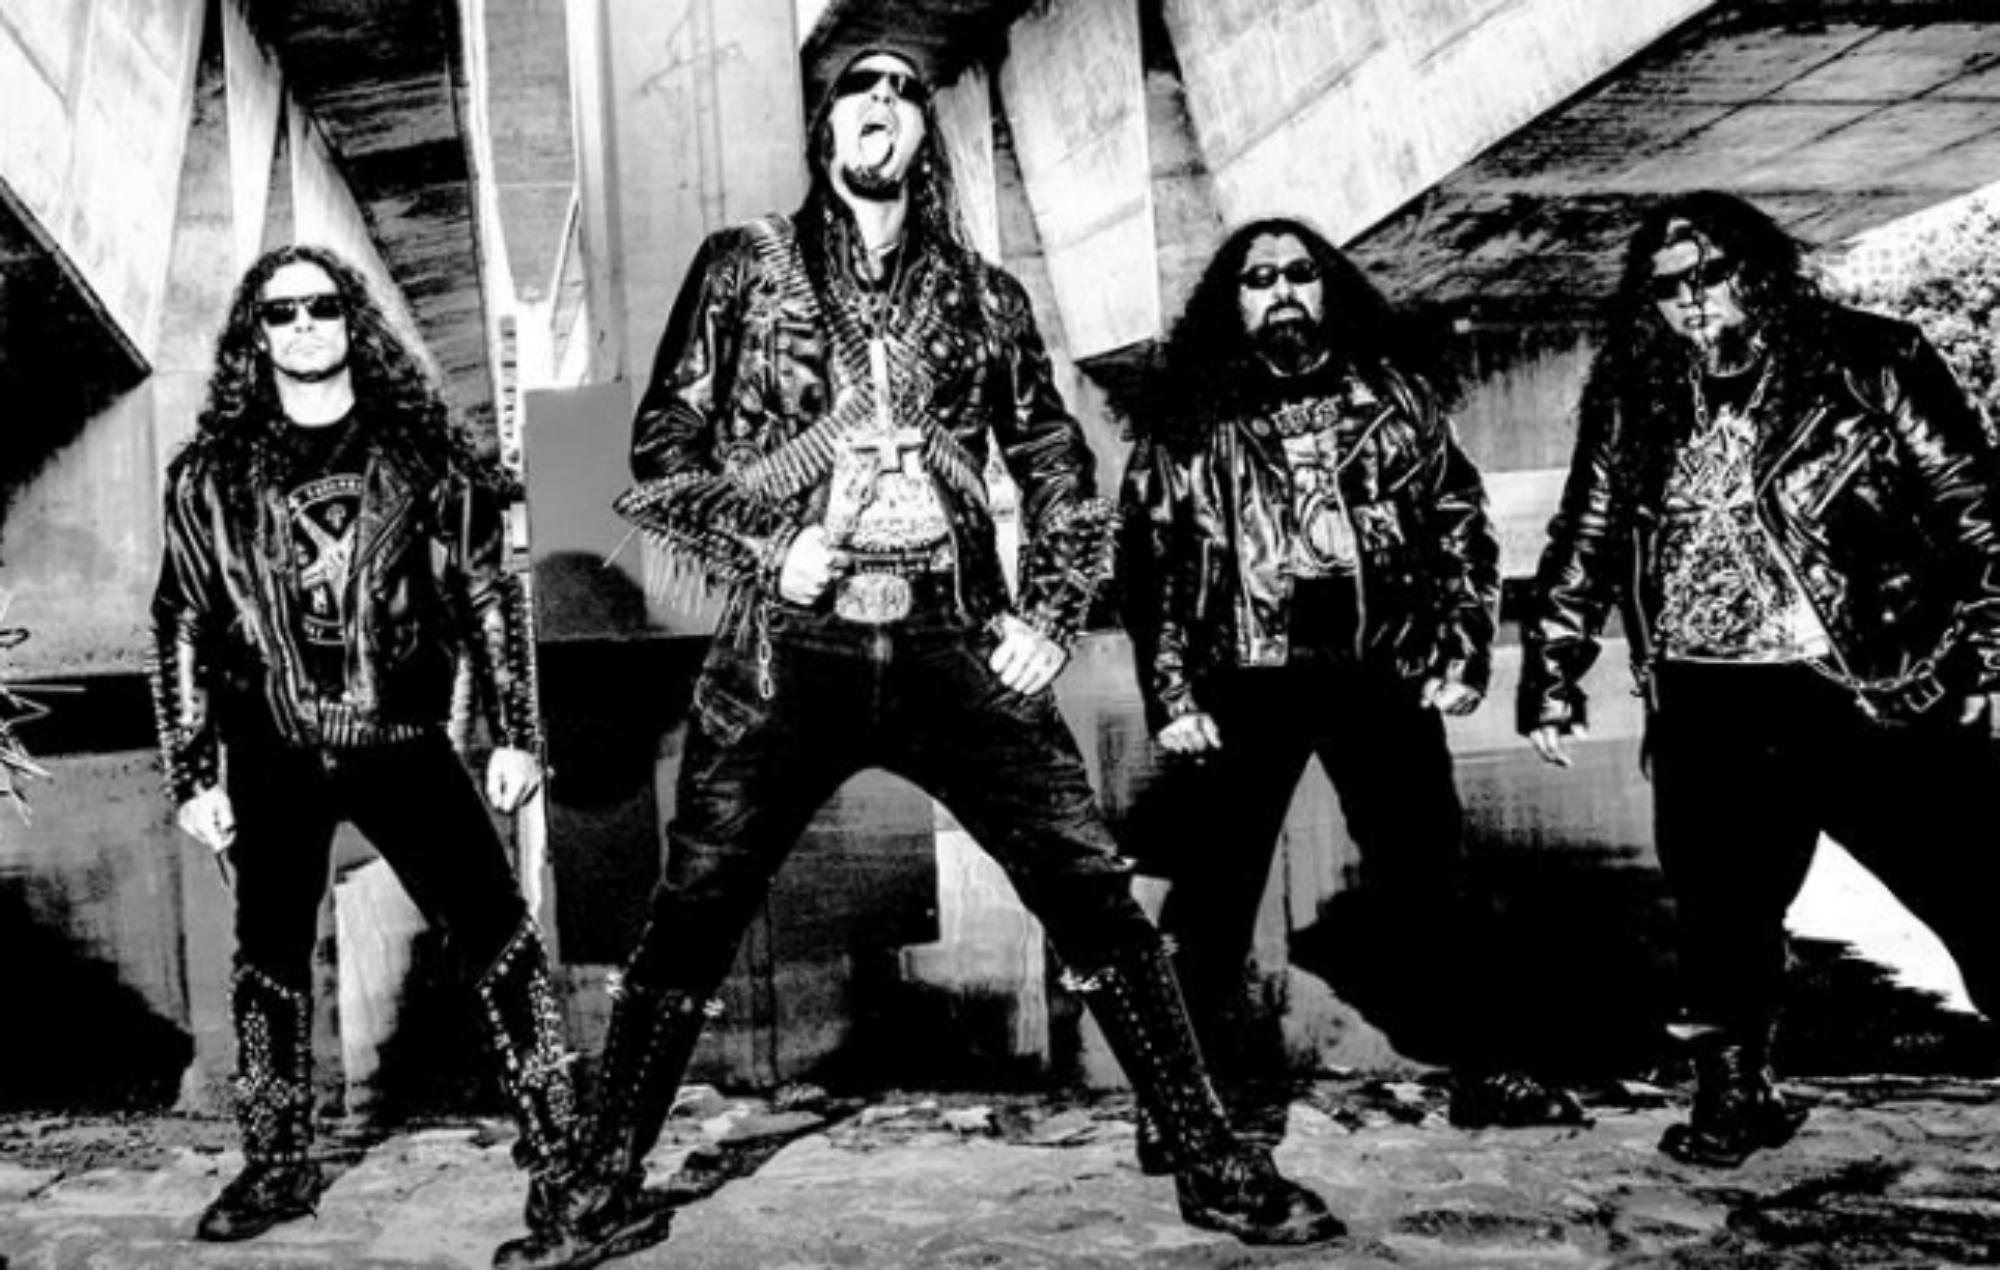 Black Metal | Musicfanfic Wiki | FANDOM powered by Wikia